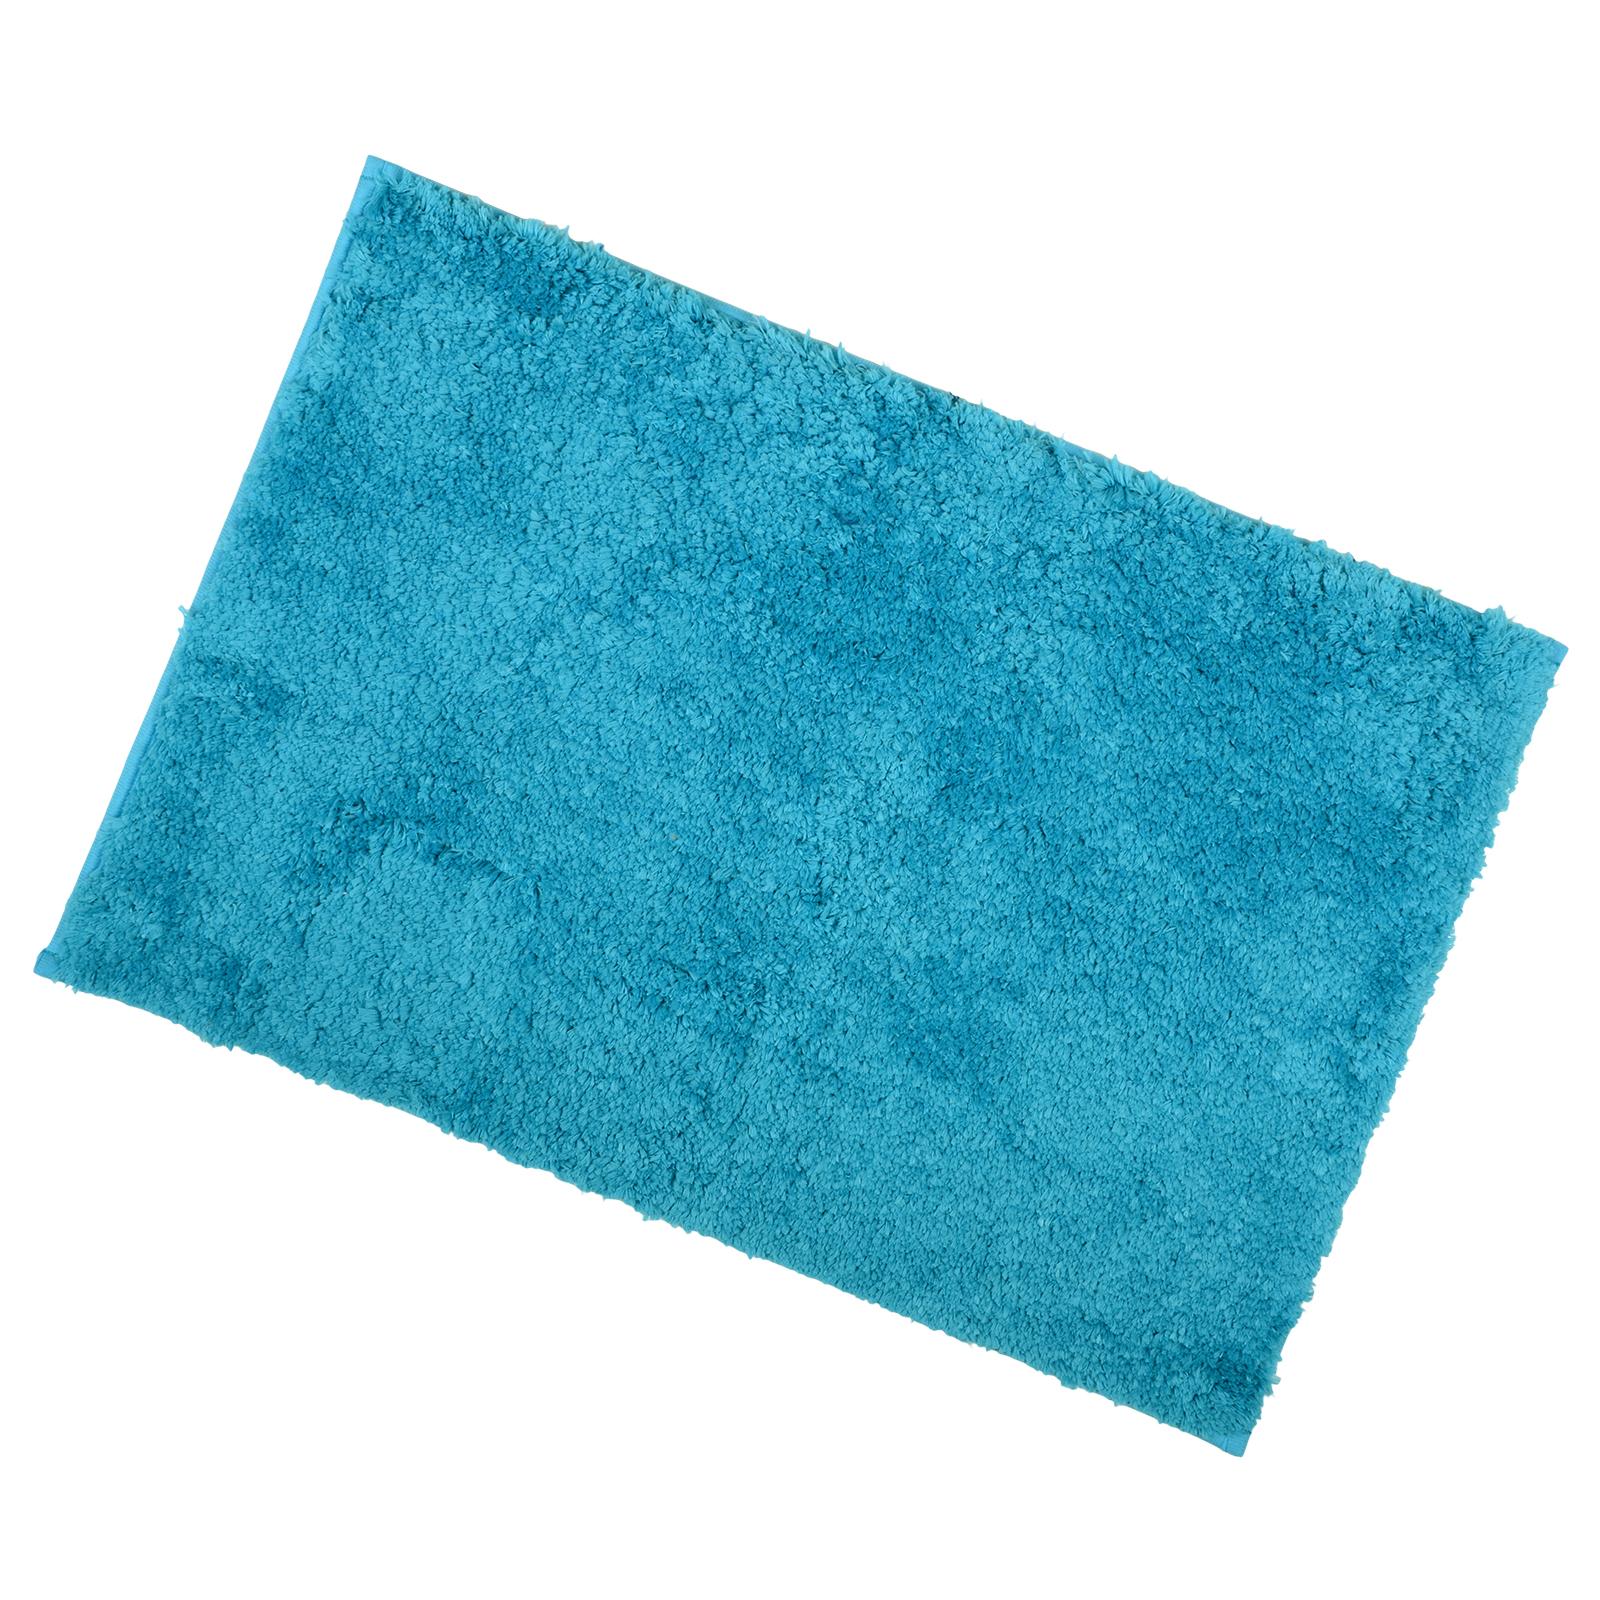 luxury microfibre tufted bath mat with anti slip backing bathroom shower rug ebay. Black Bedroom Furniture Sets. Home Design Ideas